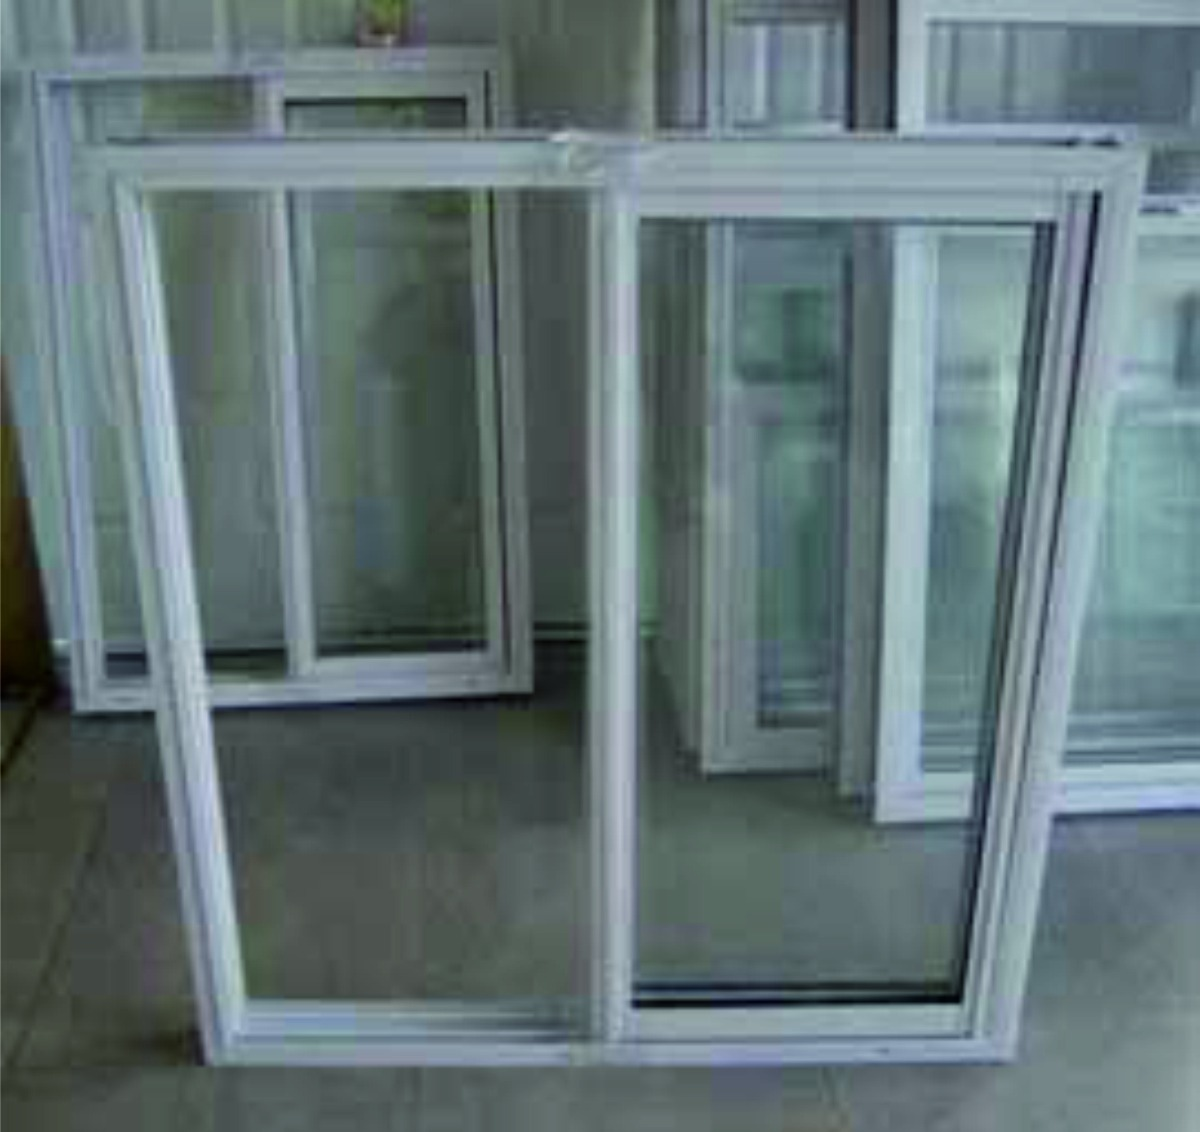 Precio ventanas climalit accesorios ventanas with precio ventanas climalit gallery of precios - Precio cristal climalit ...